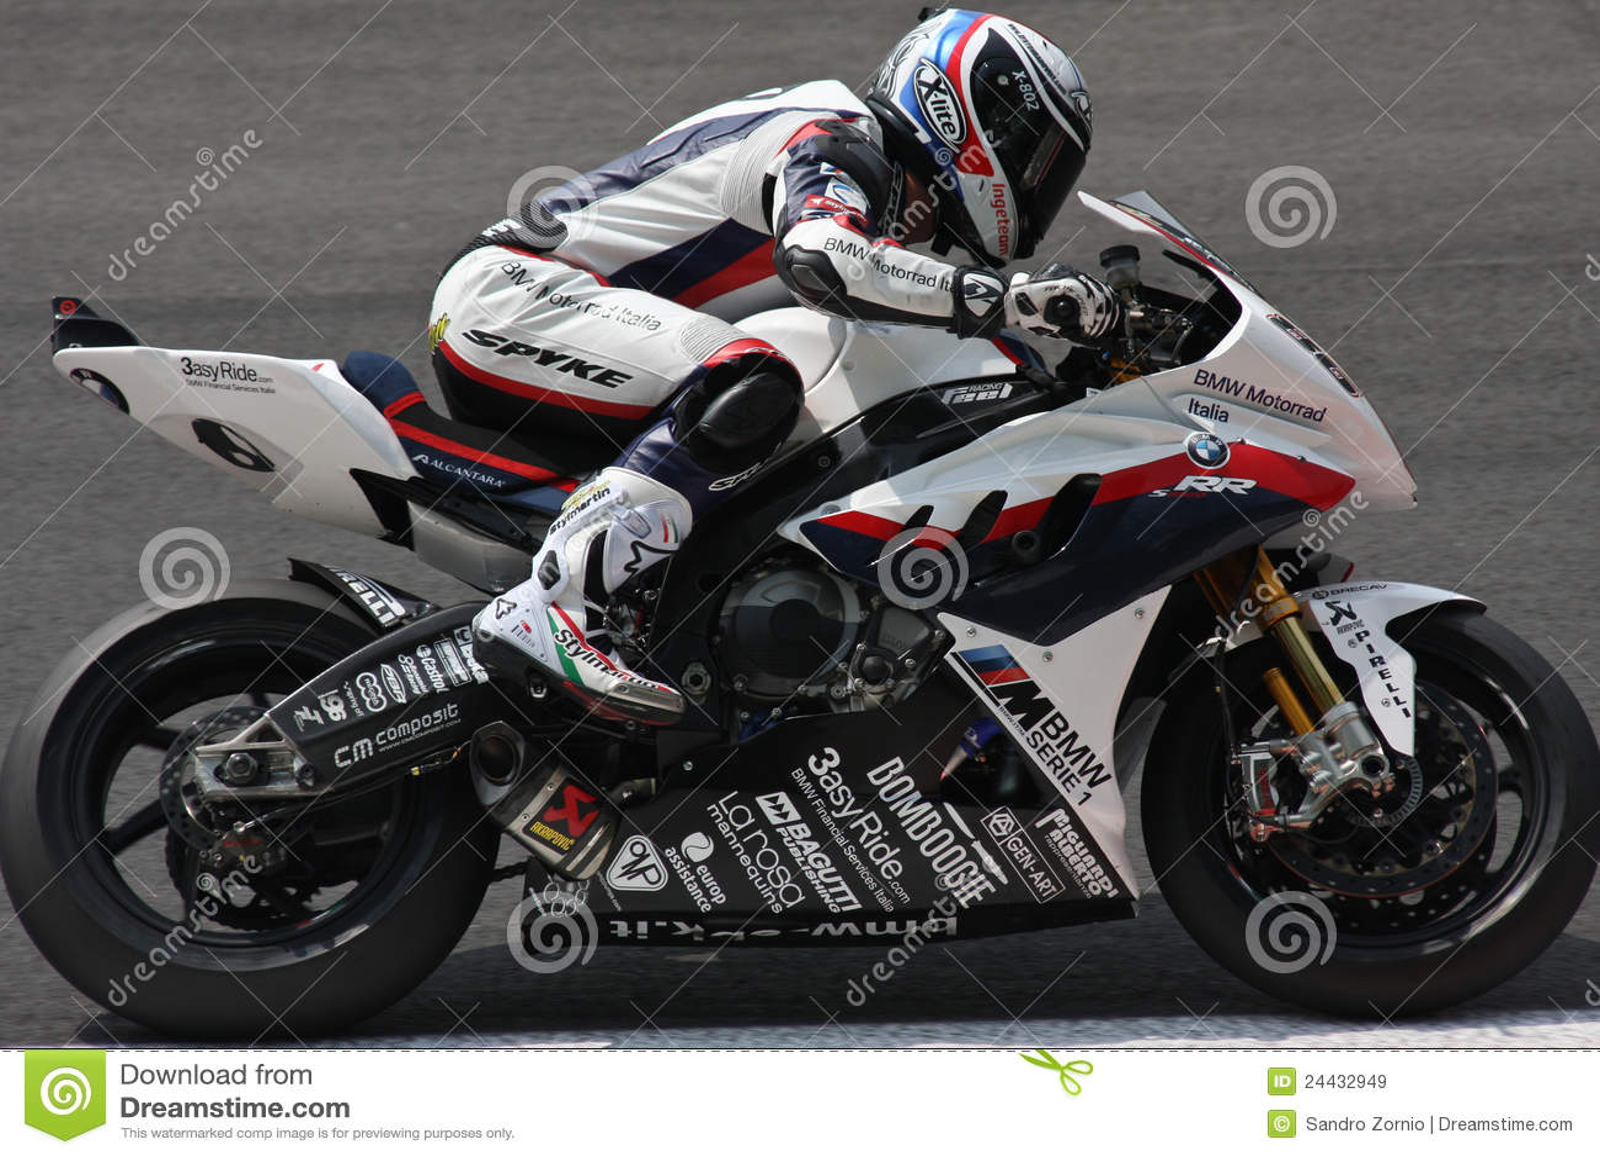 Troy Corser Bmw S1000 Rr Bmw Motorrad Motorsport Editorial Stock